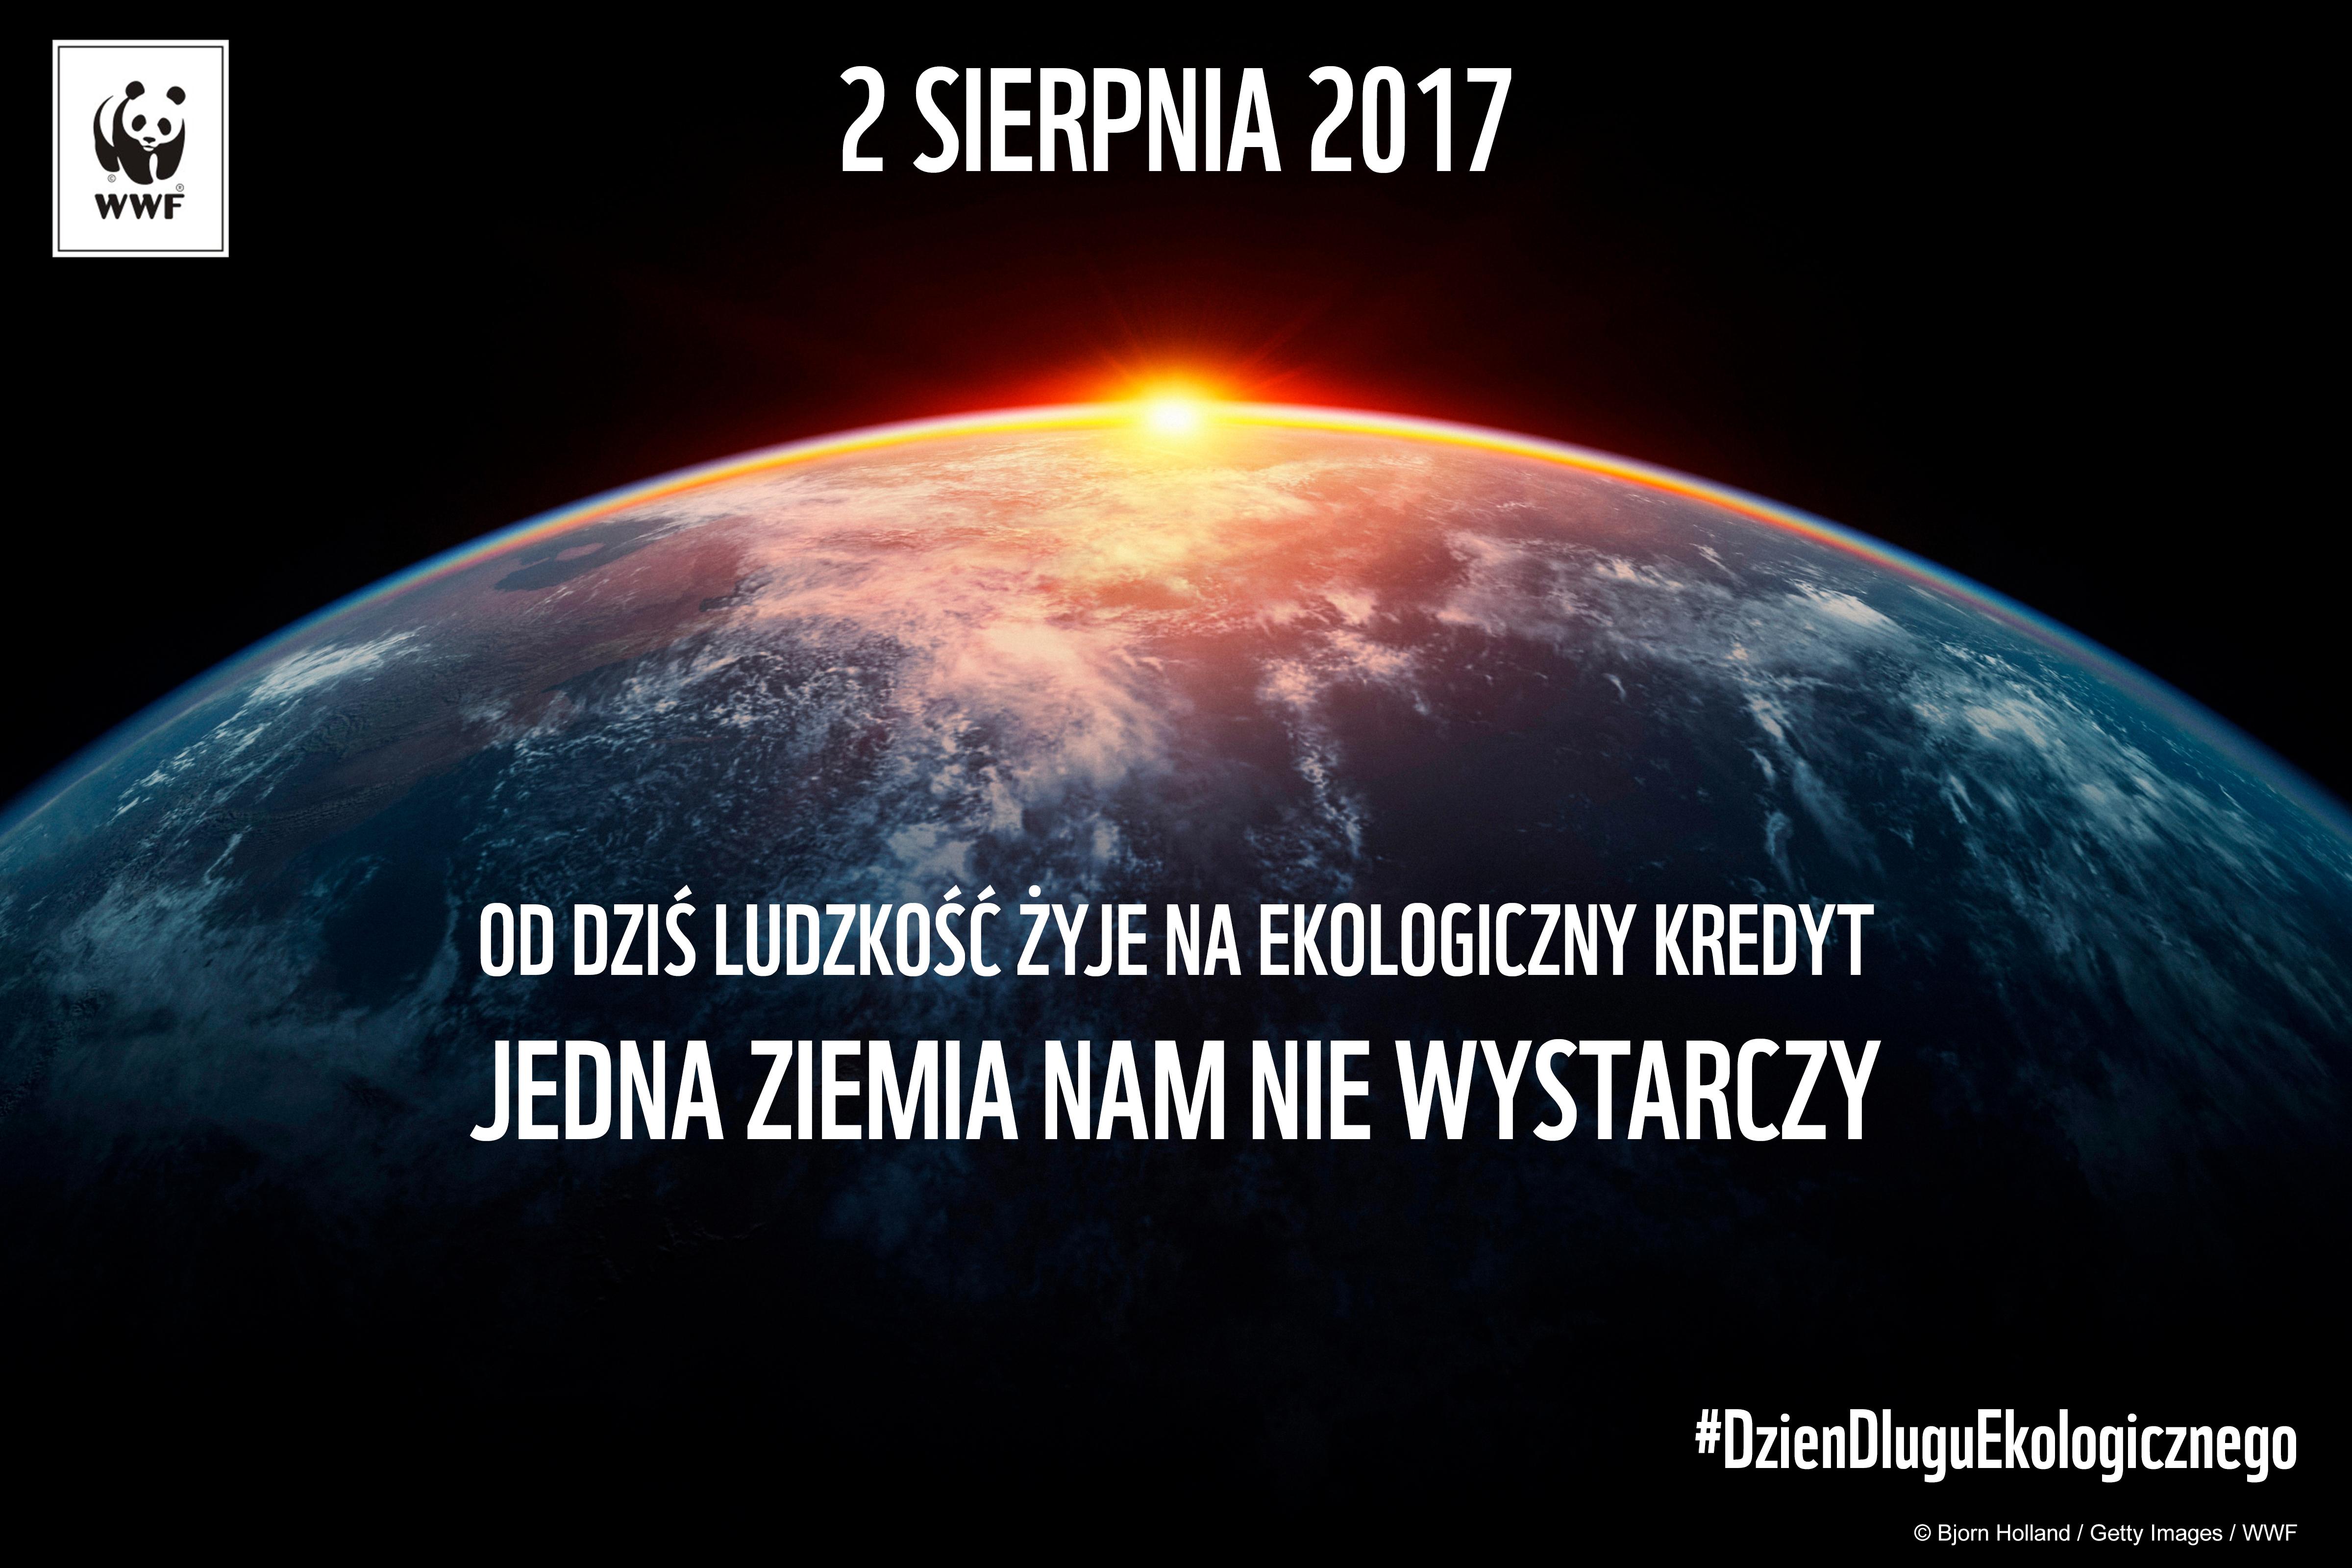 WWF - kredyt 2017